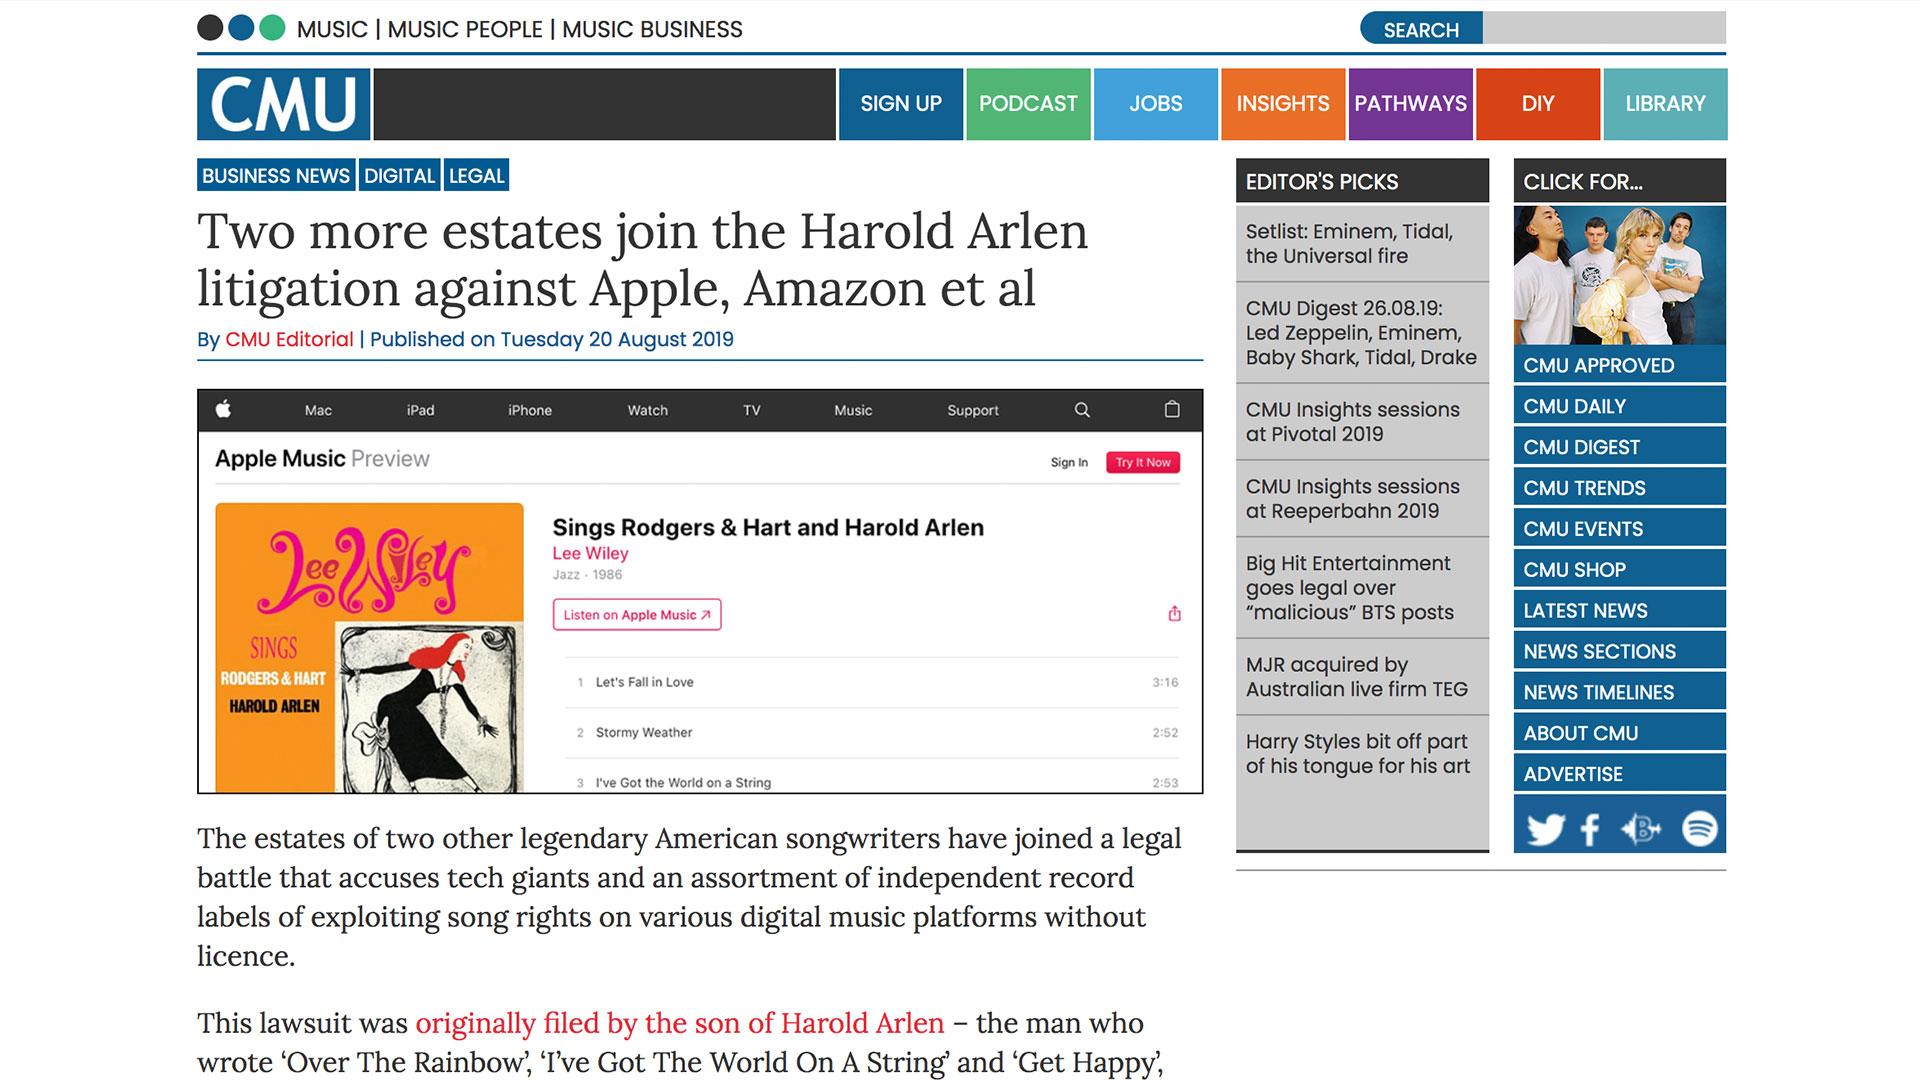 Fairness Rocks News Two more estates join the Harold Arlen litigation against Apple, Amazon et al